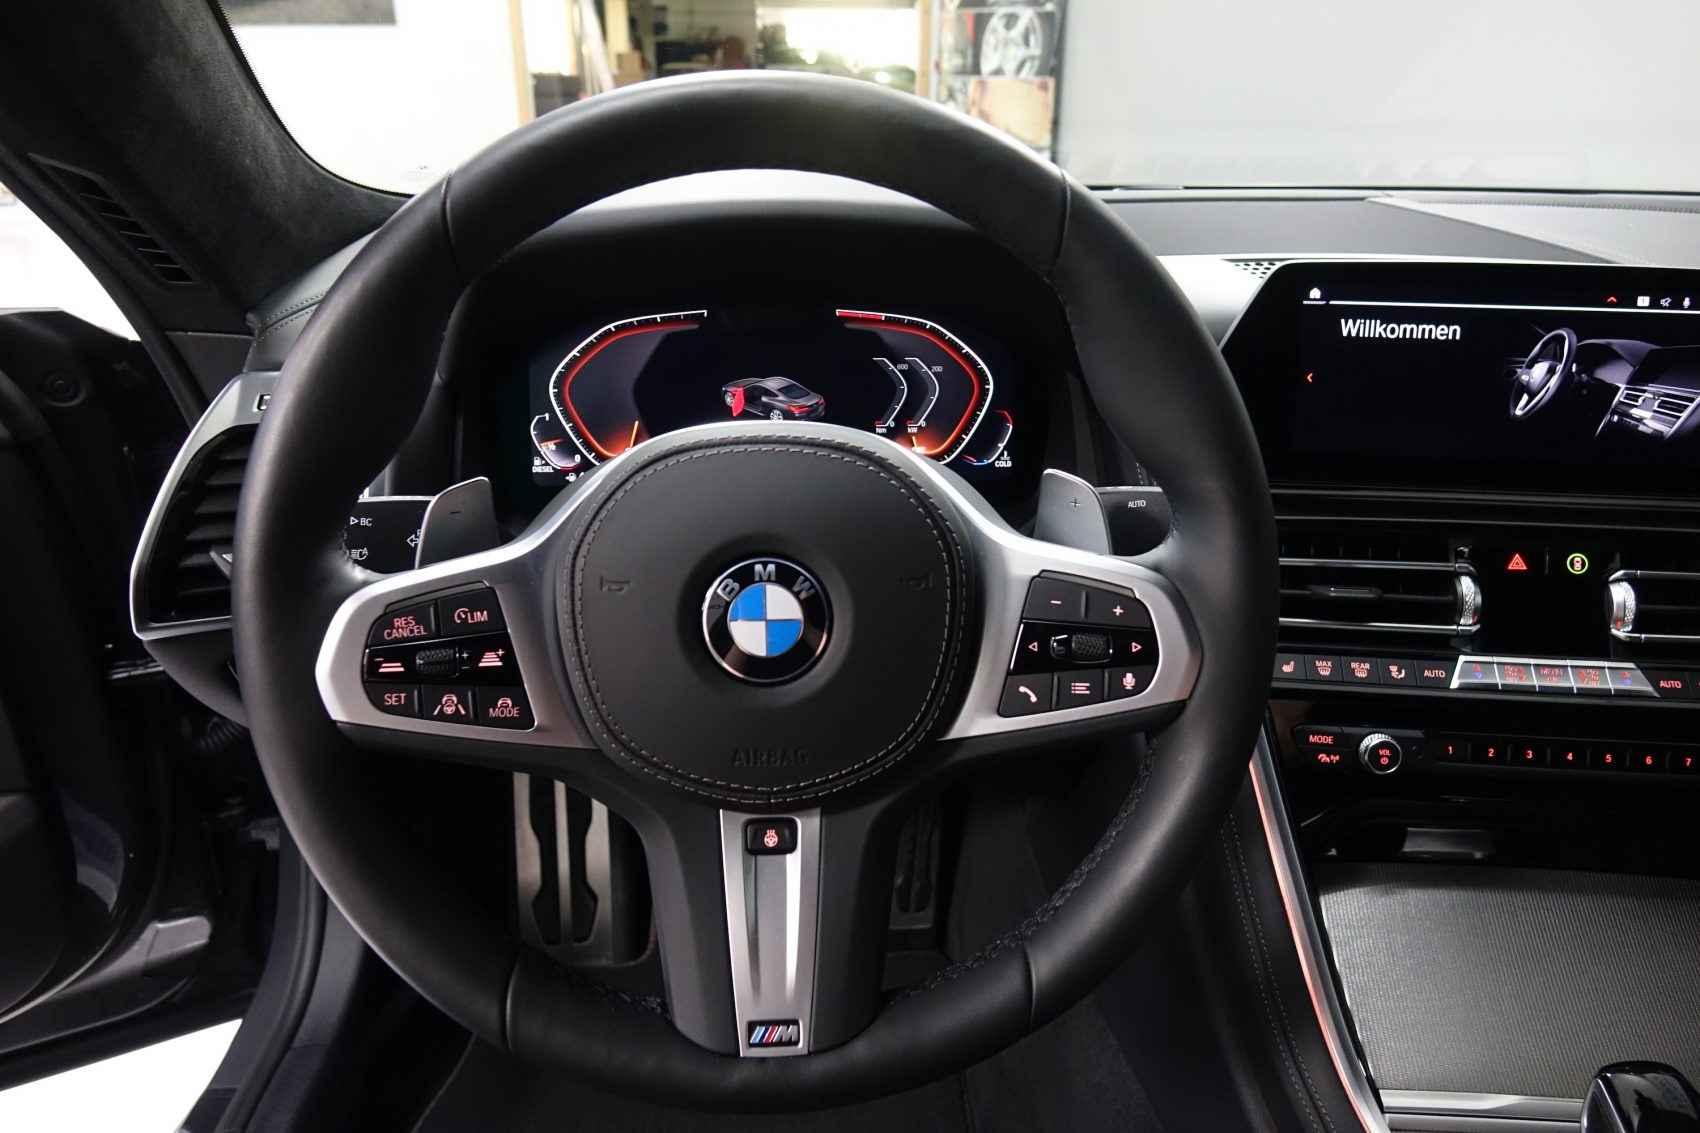 BMW - 840D XDRIVE COUPE M-SPORT - Assetto Corsa